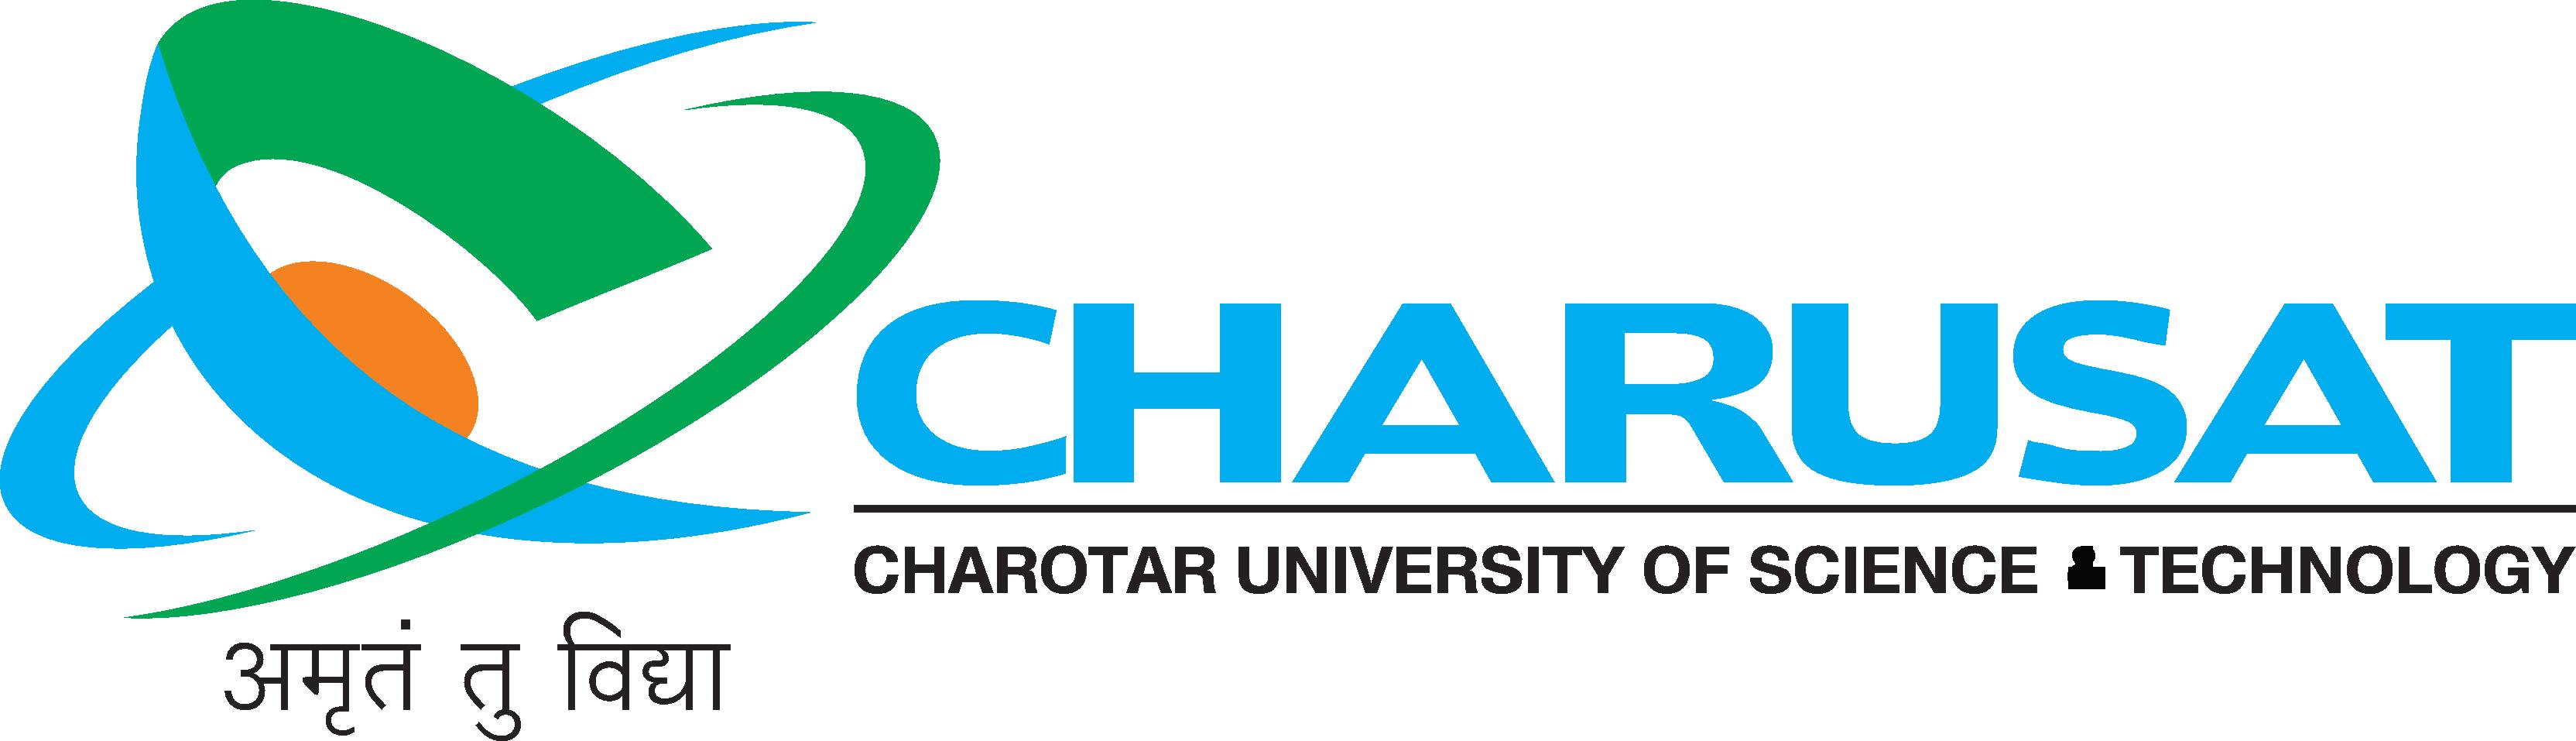 Charotar University of Science & Technology B.Tech  M.tech BCA MCA